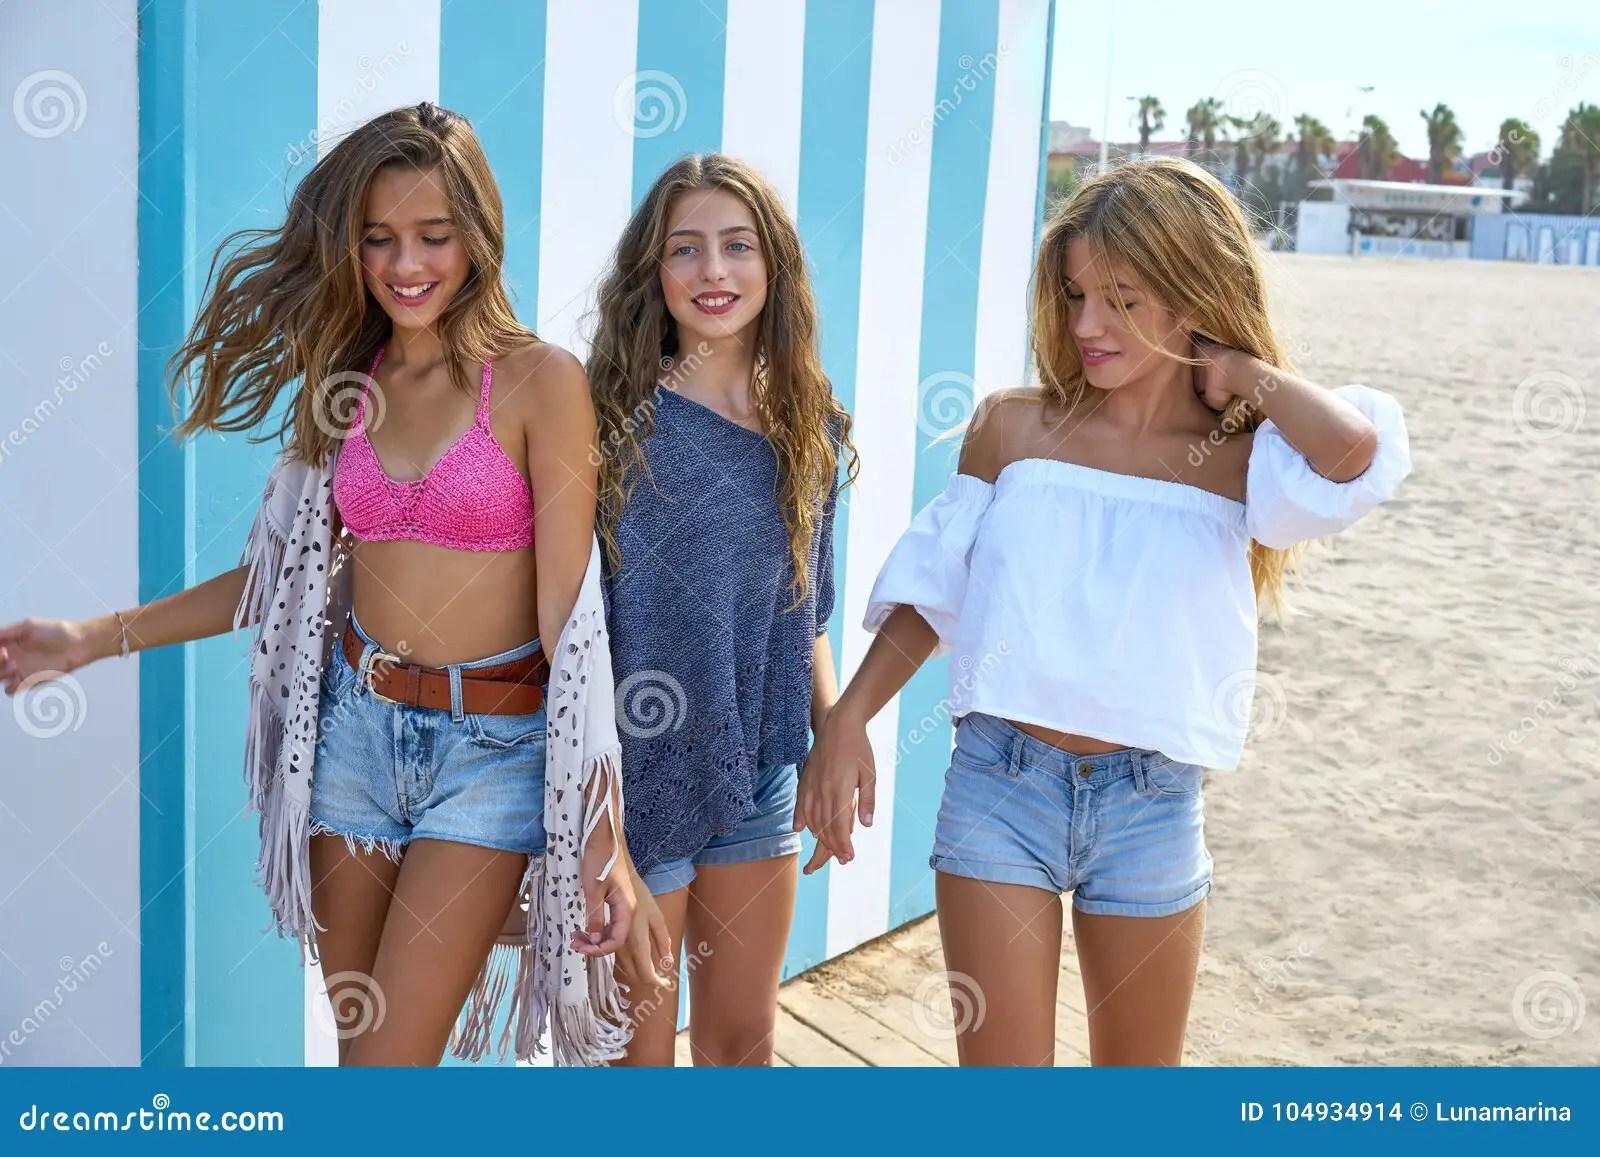 Best Friends Teen Girls Group Happy In A Summer Blue Stripes Background